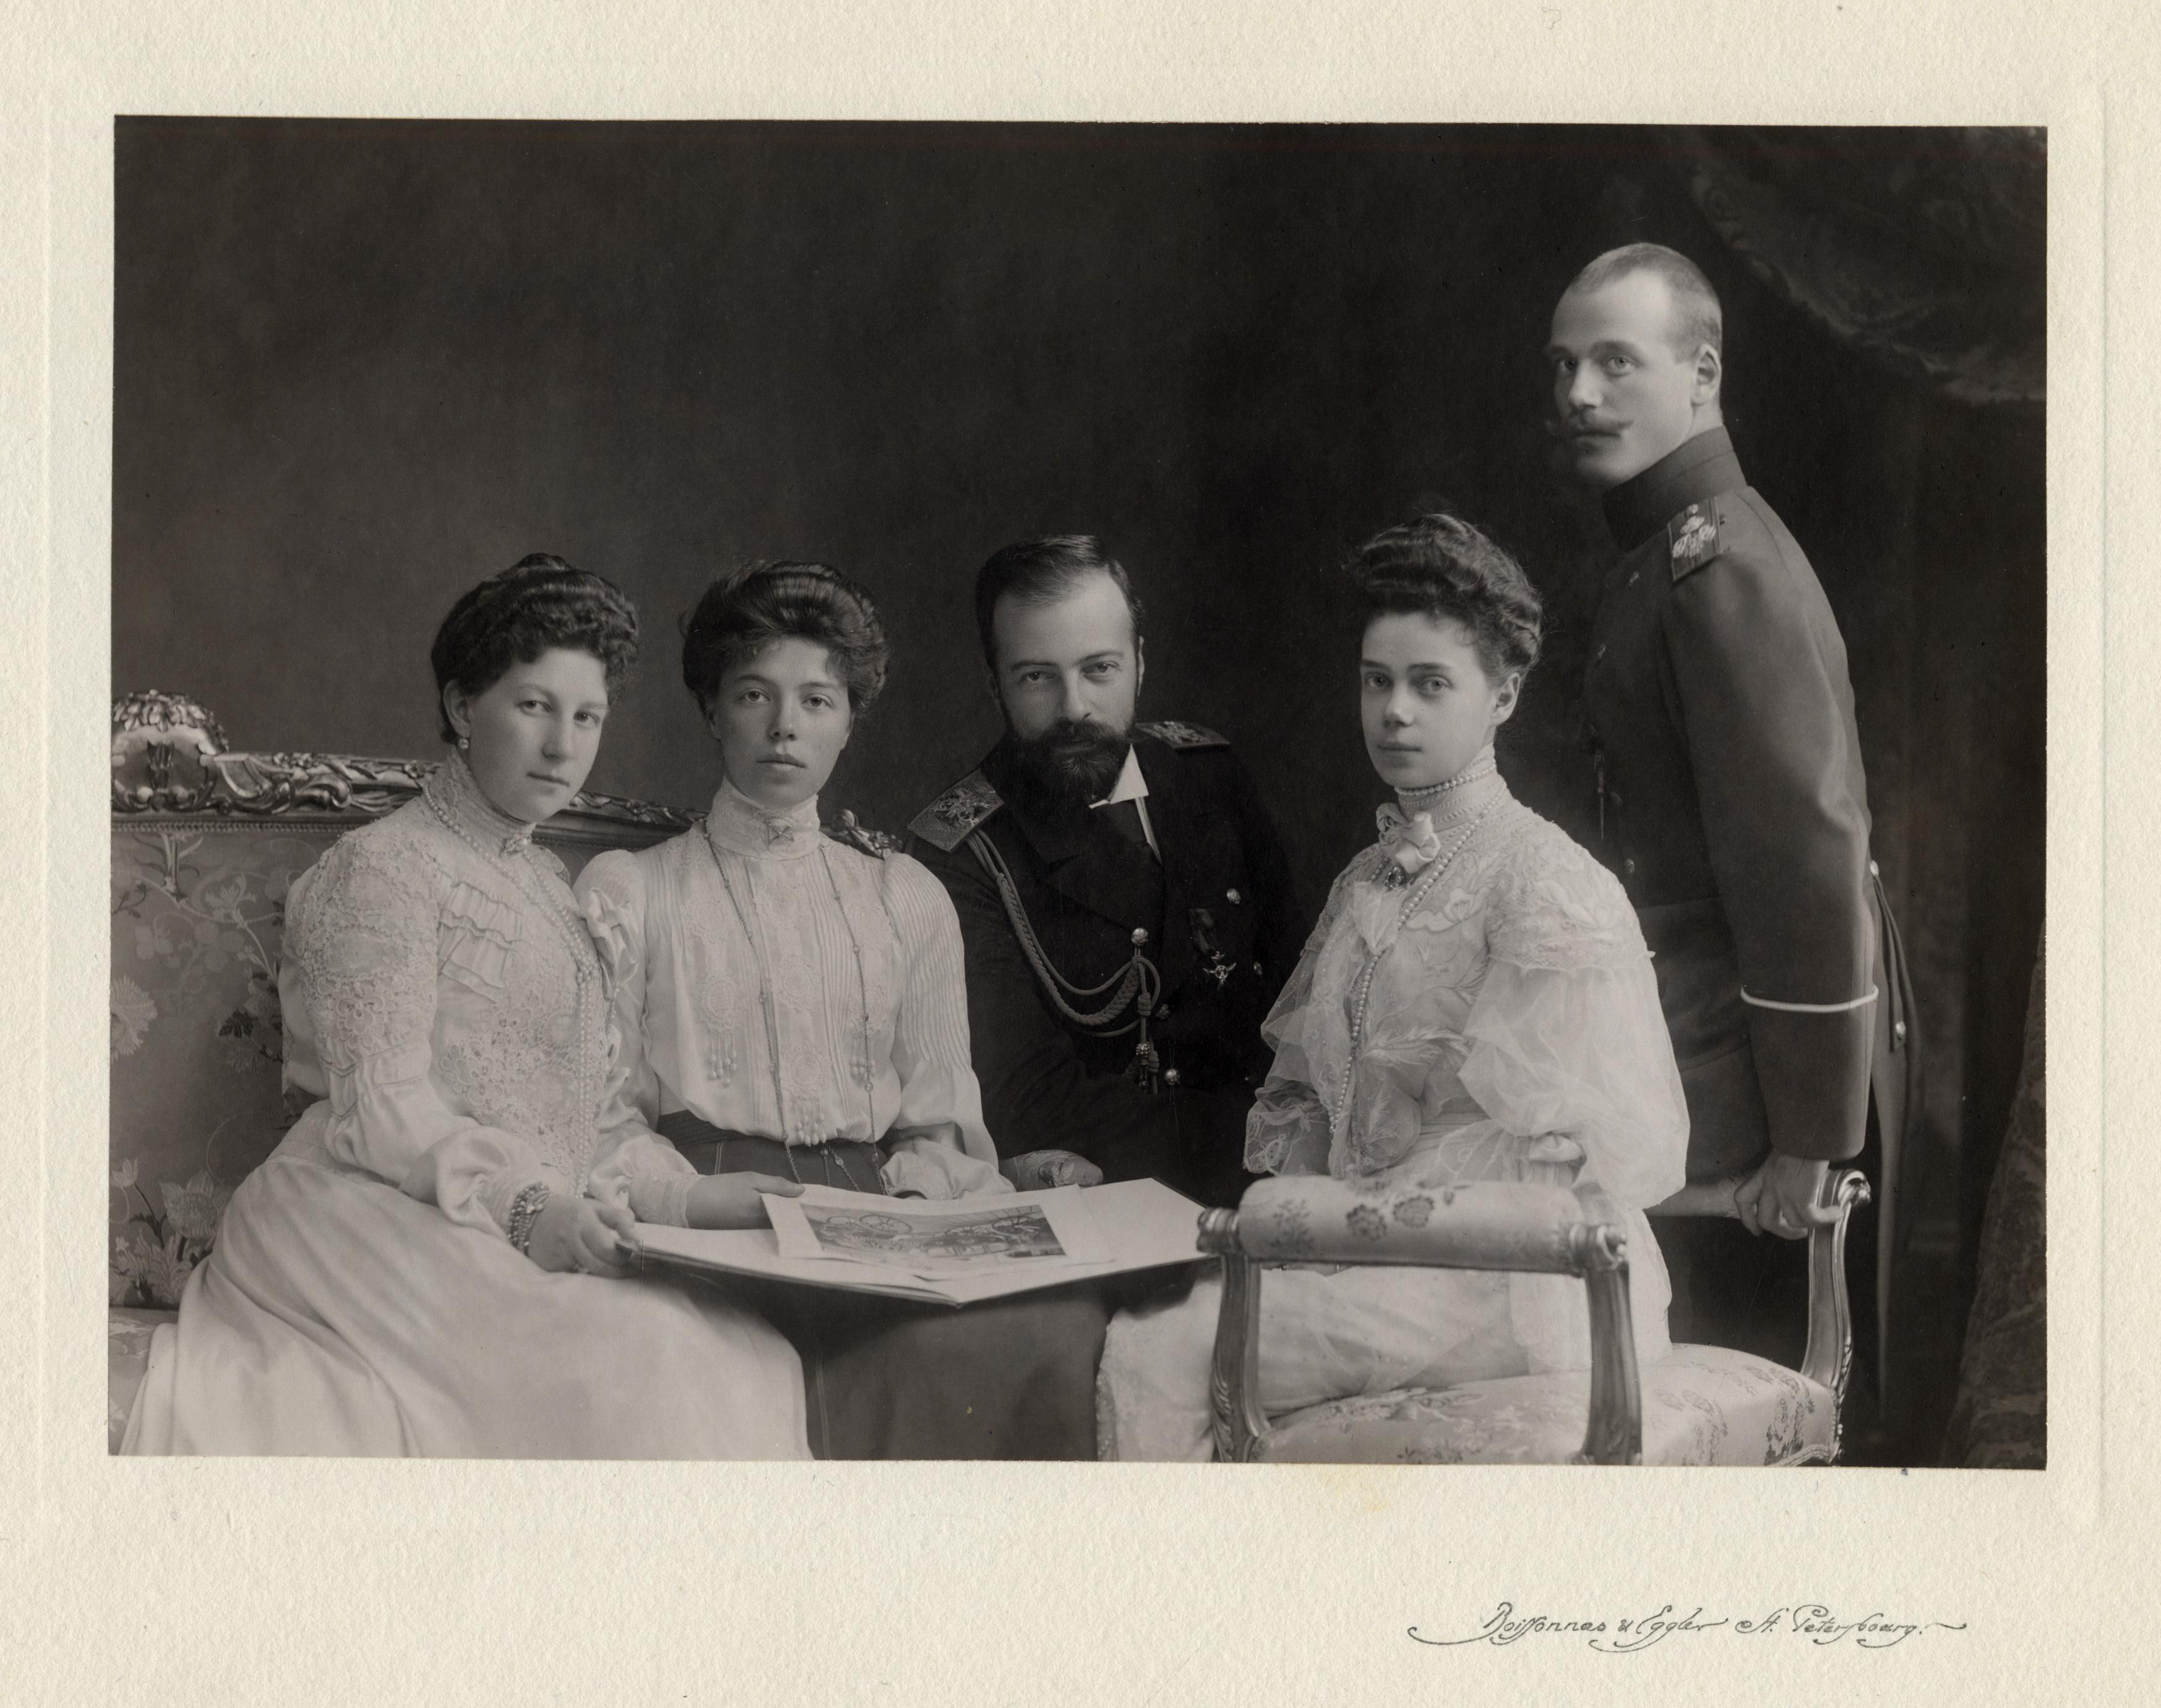 Portrait de Maria Georgievna, Olga Alexandrovna, Alexandre  Mikhaïlovitch, Xenia Alexandrovna et Michel Alexandrovitch